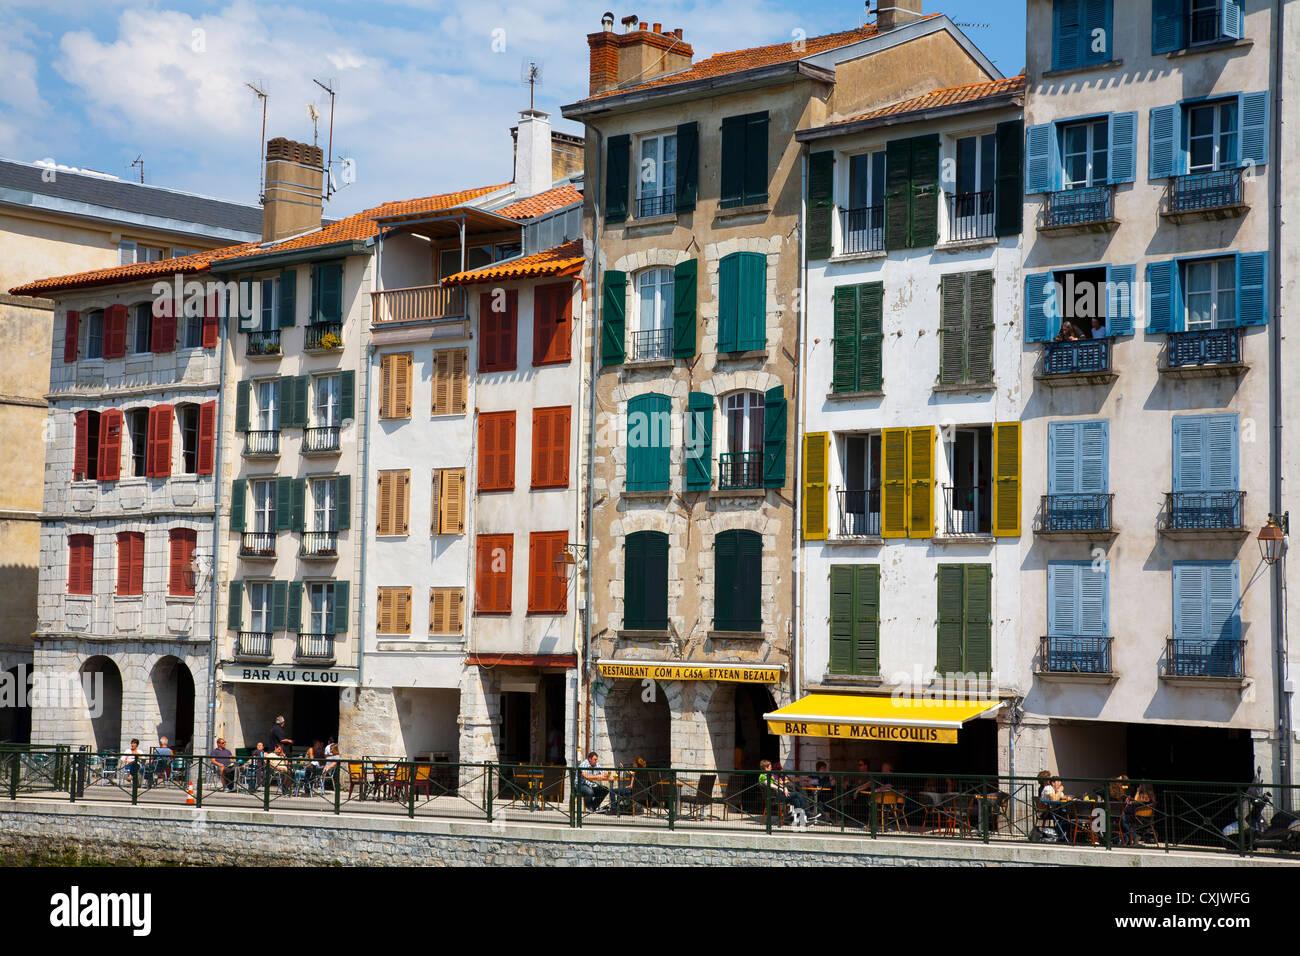 Facades in Petit Bayonne. Bayonne. Pyrénées-Atlantiques, France. - Stock Image